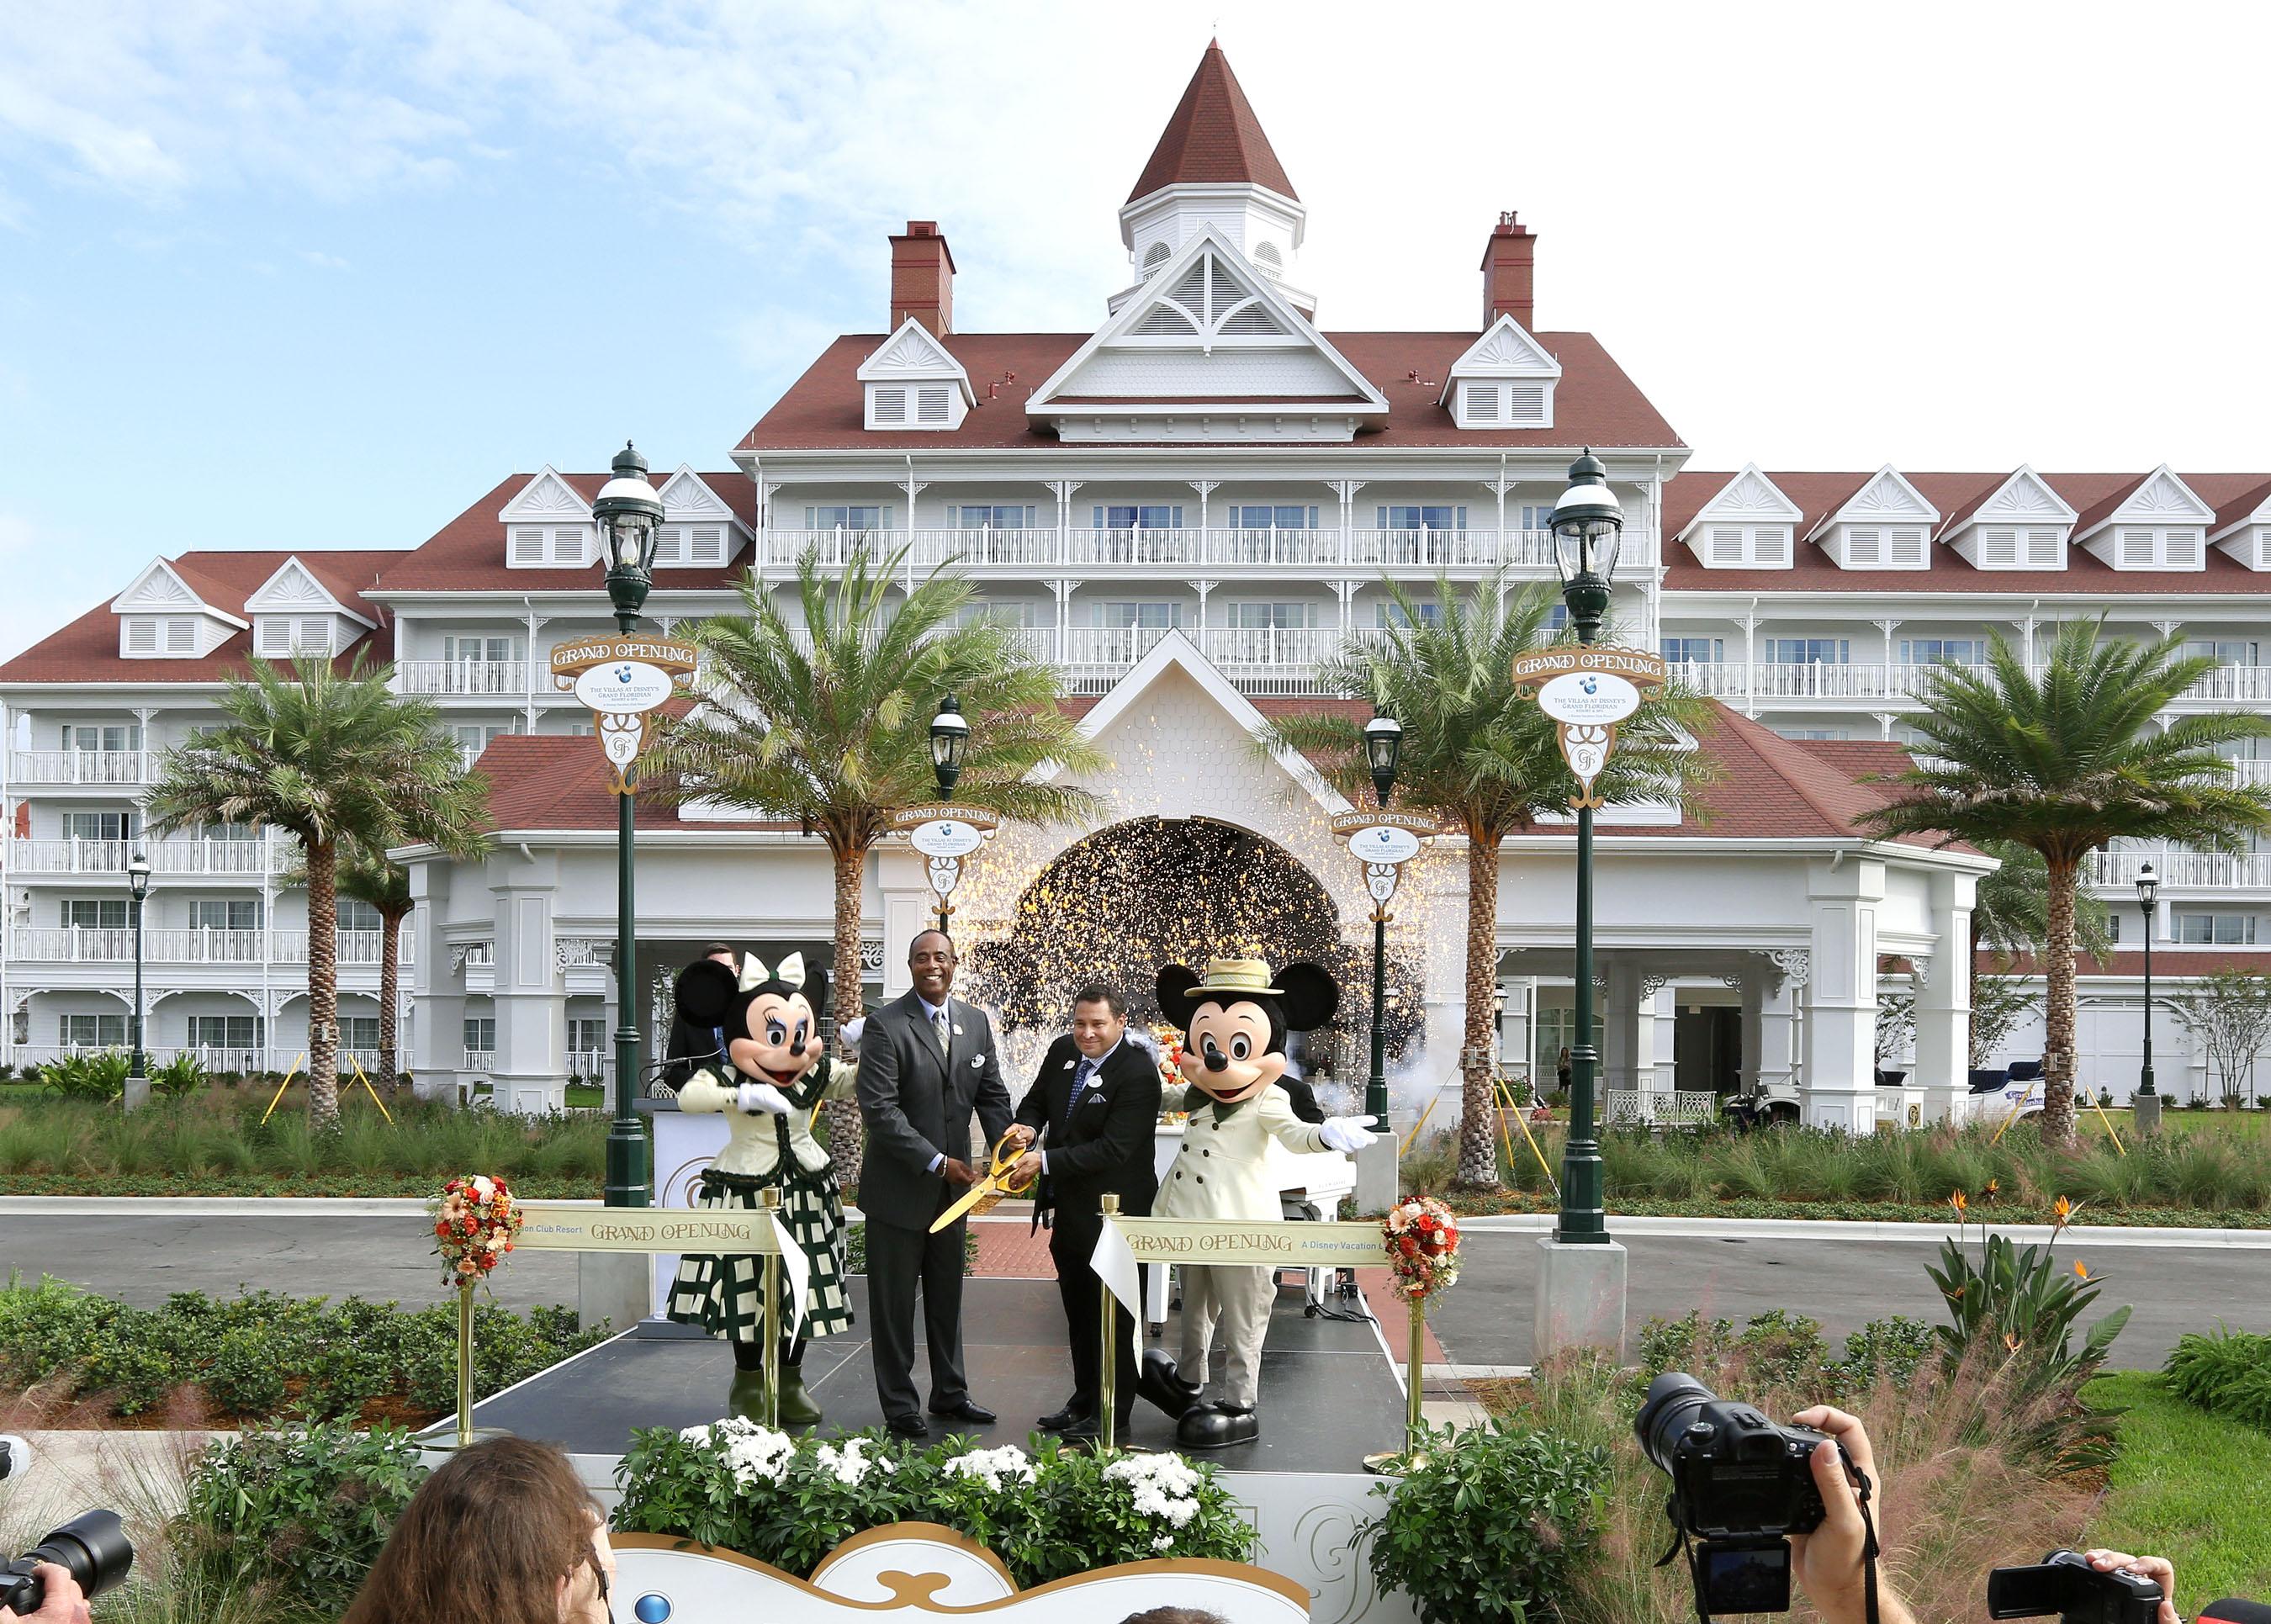 Disney Grand Floridian Villas